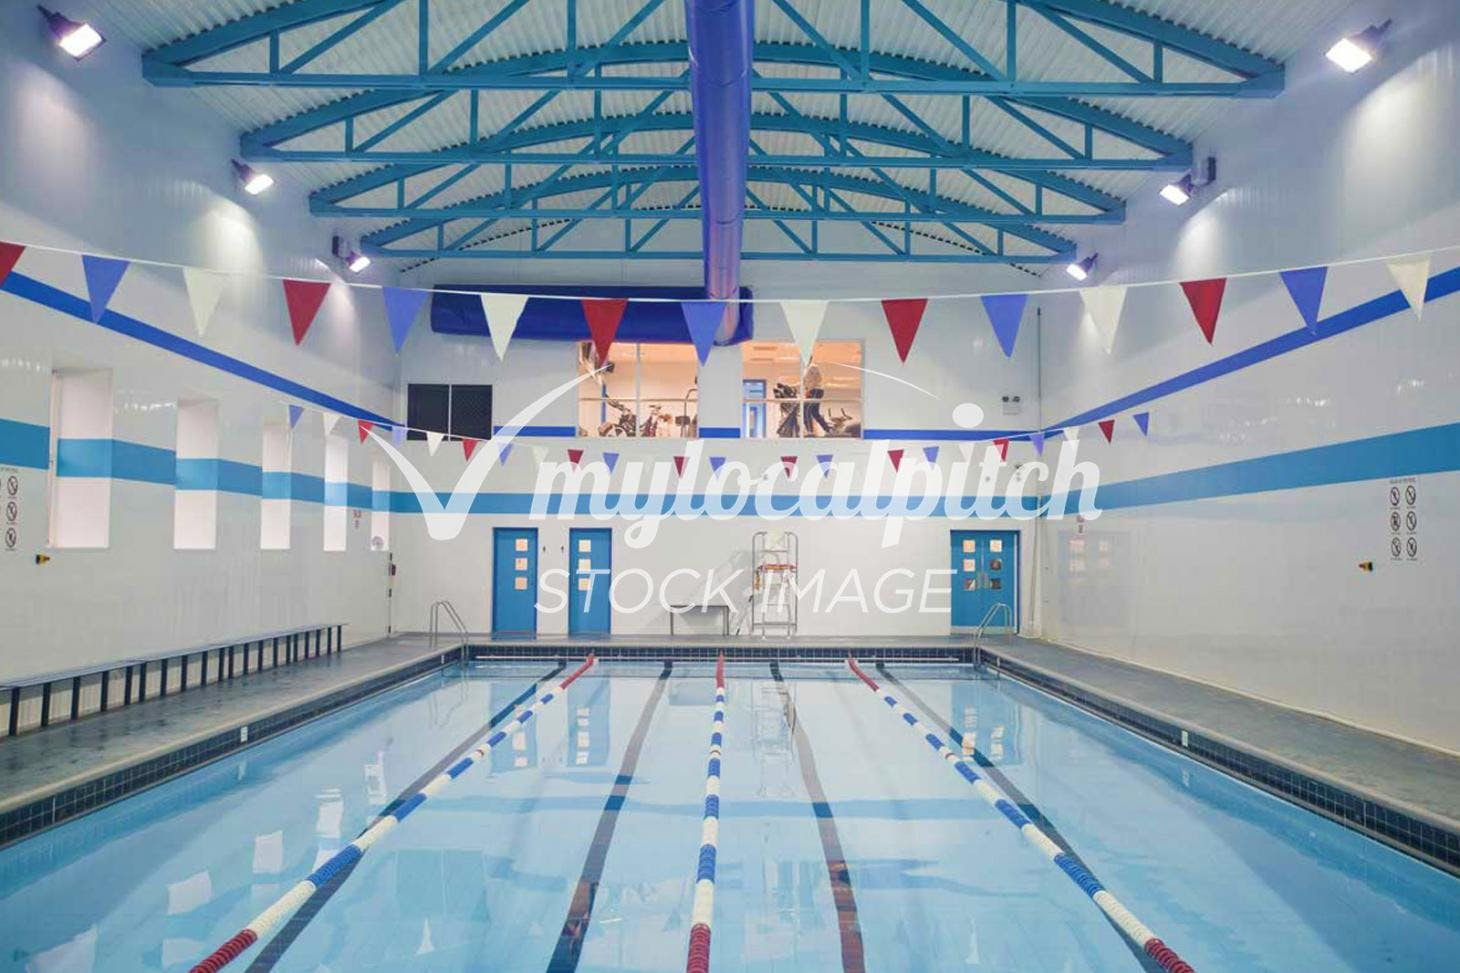 Brixton Recreation Centre Indoor swimming pool